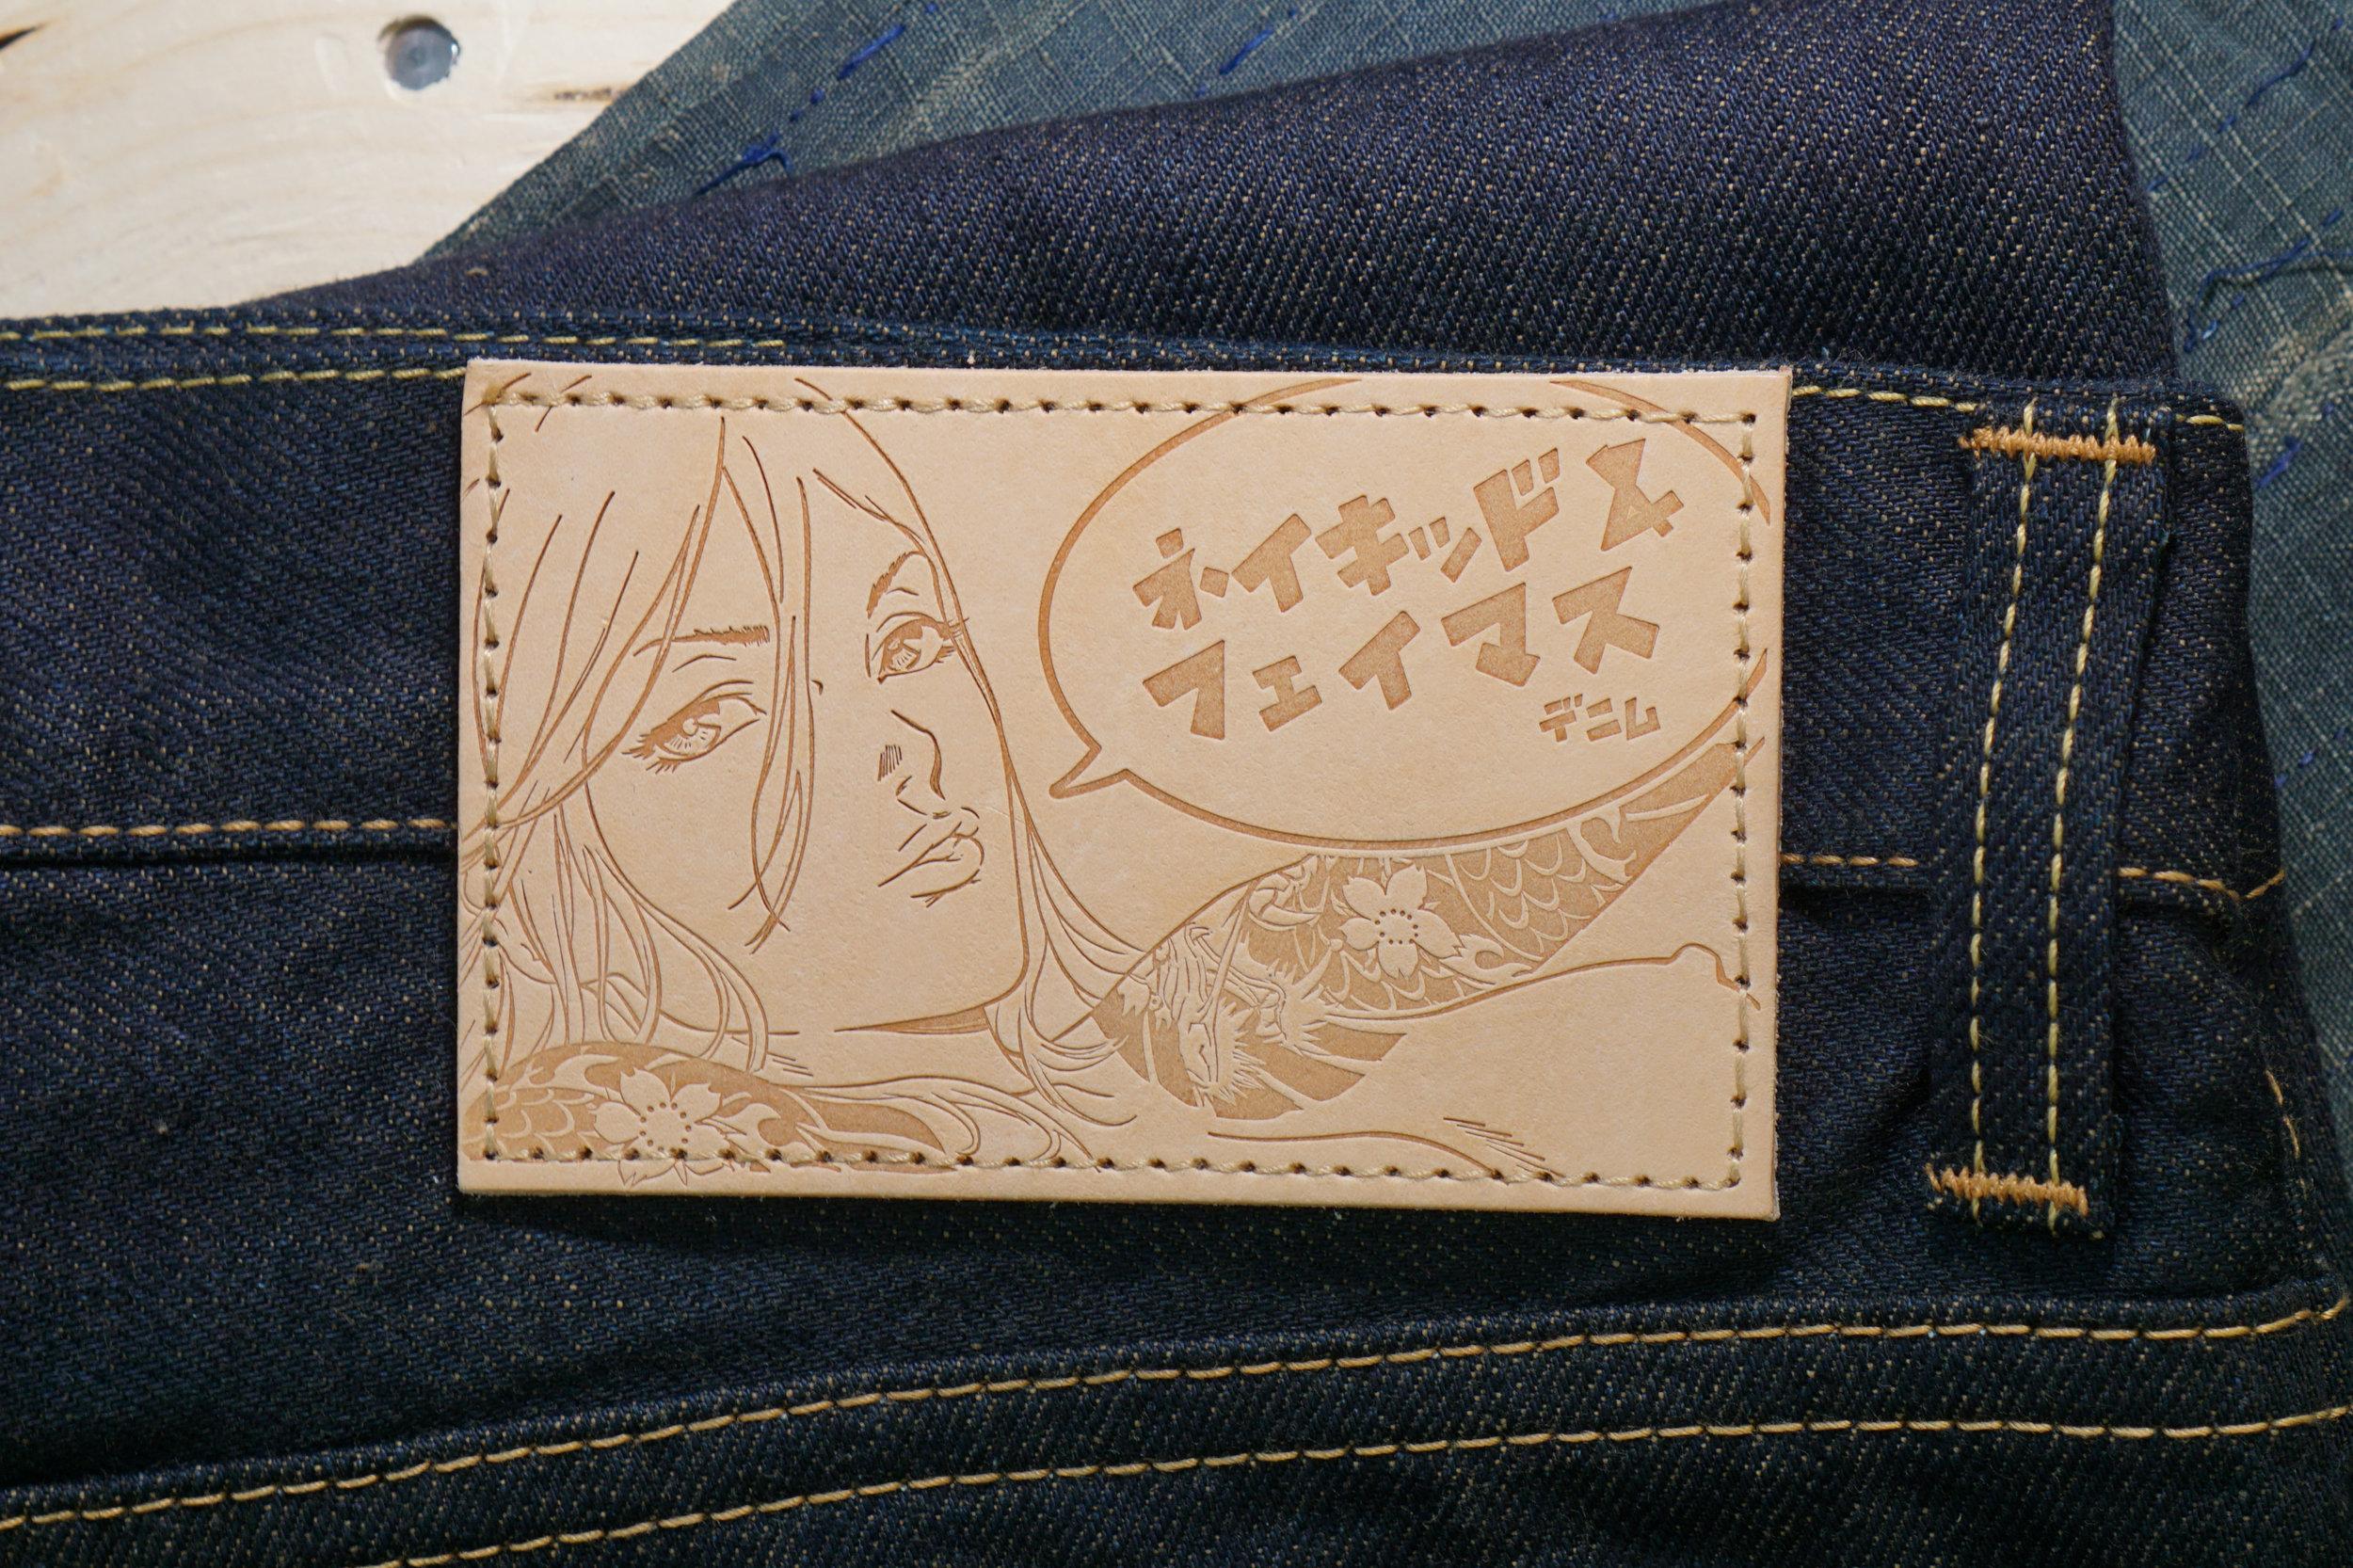 MIJ5 Kogare Kakishibu - Leather Patch